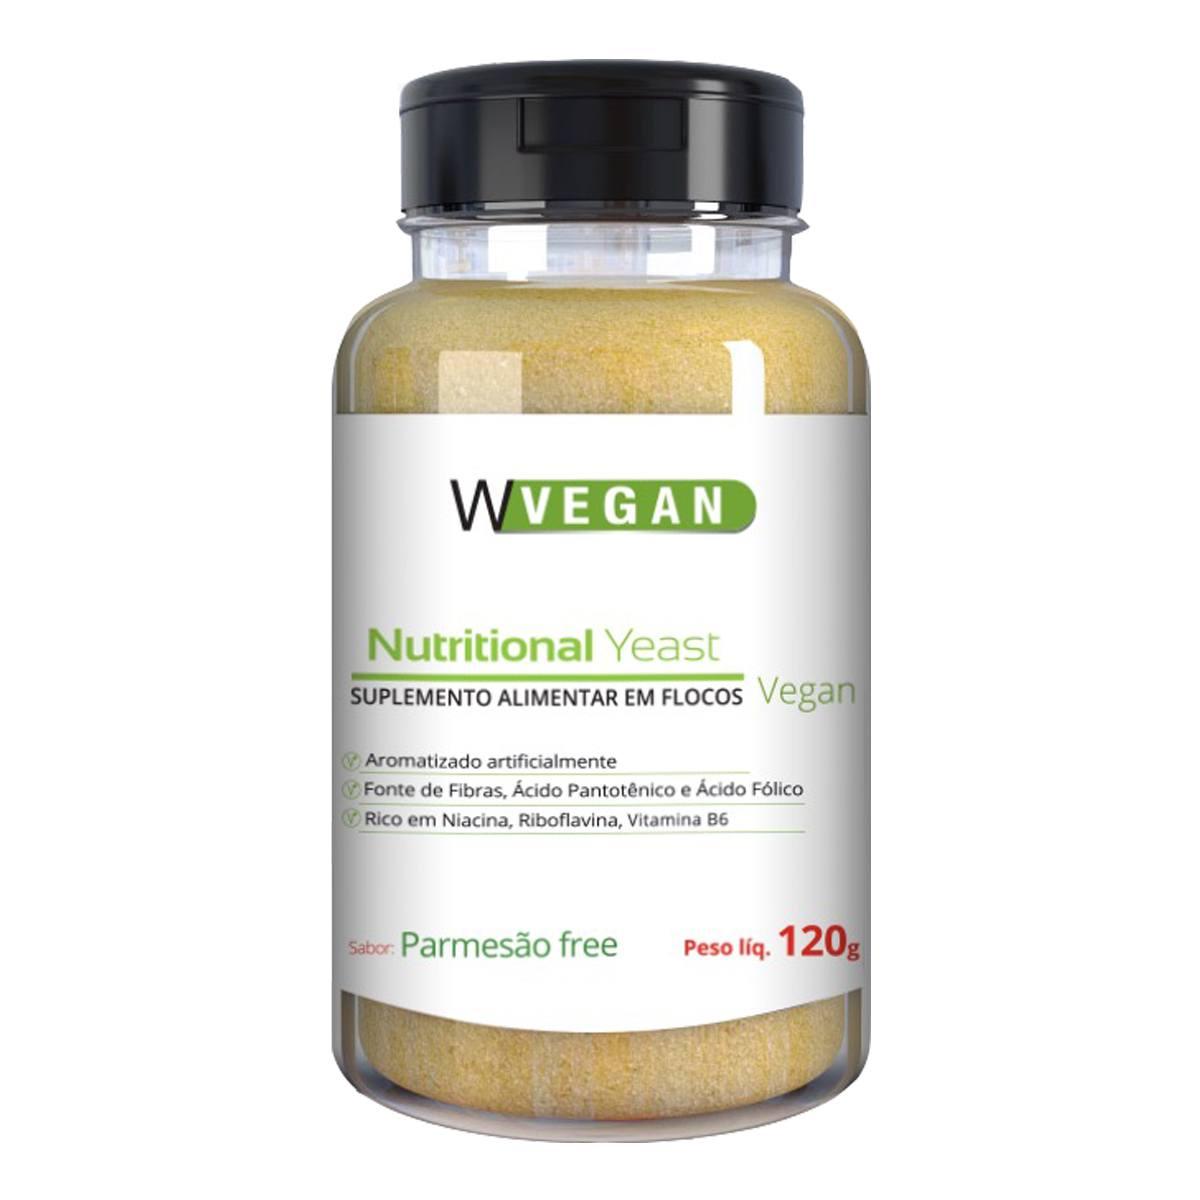 Nutritional Yeast Sabor Parmesão Free 120g WVegan